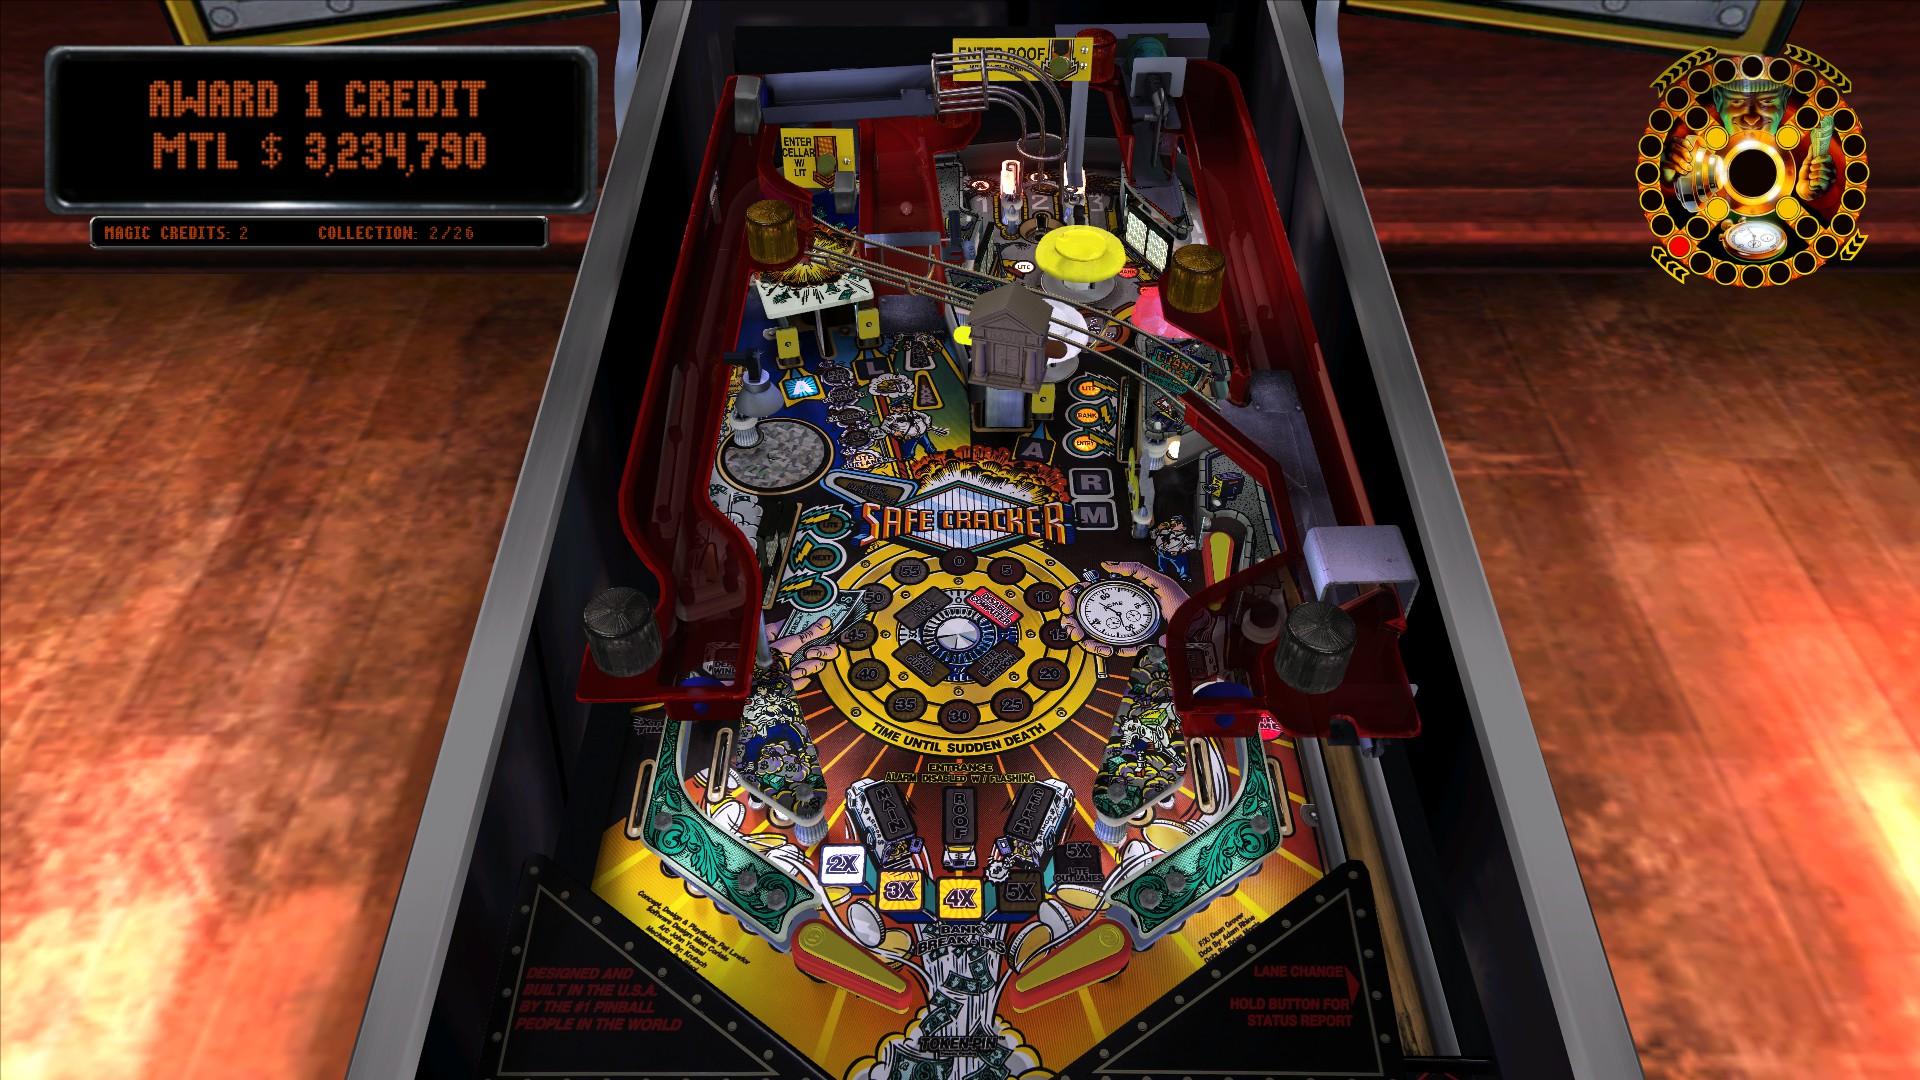 Mantalow: Pinball Arcade: Safe Cracker (PC) 3,234,790 points on 2015-09-04 01:25:59